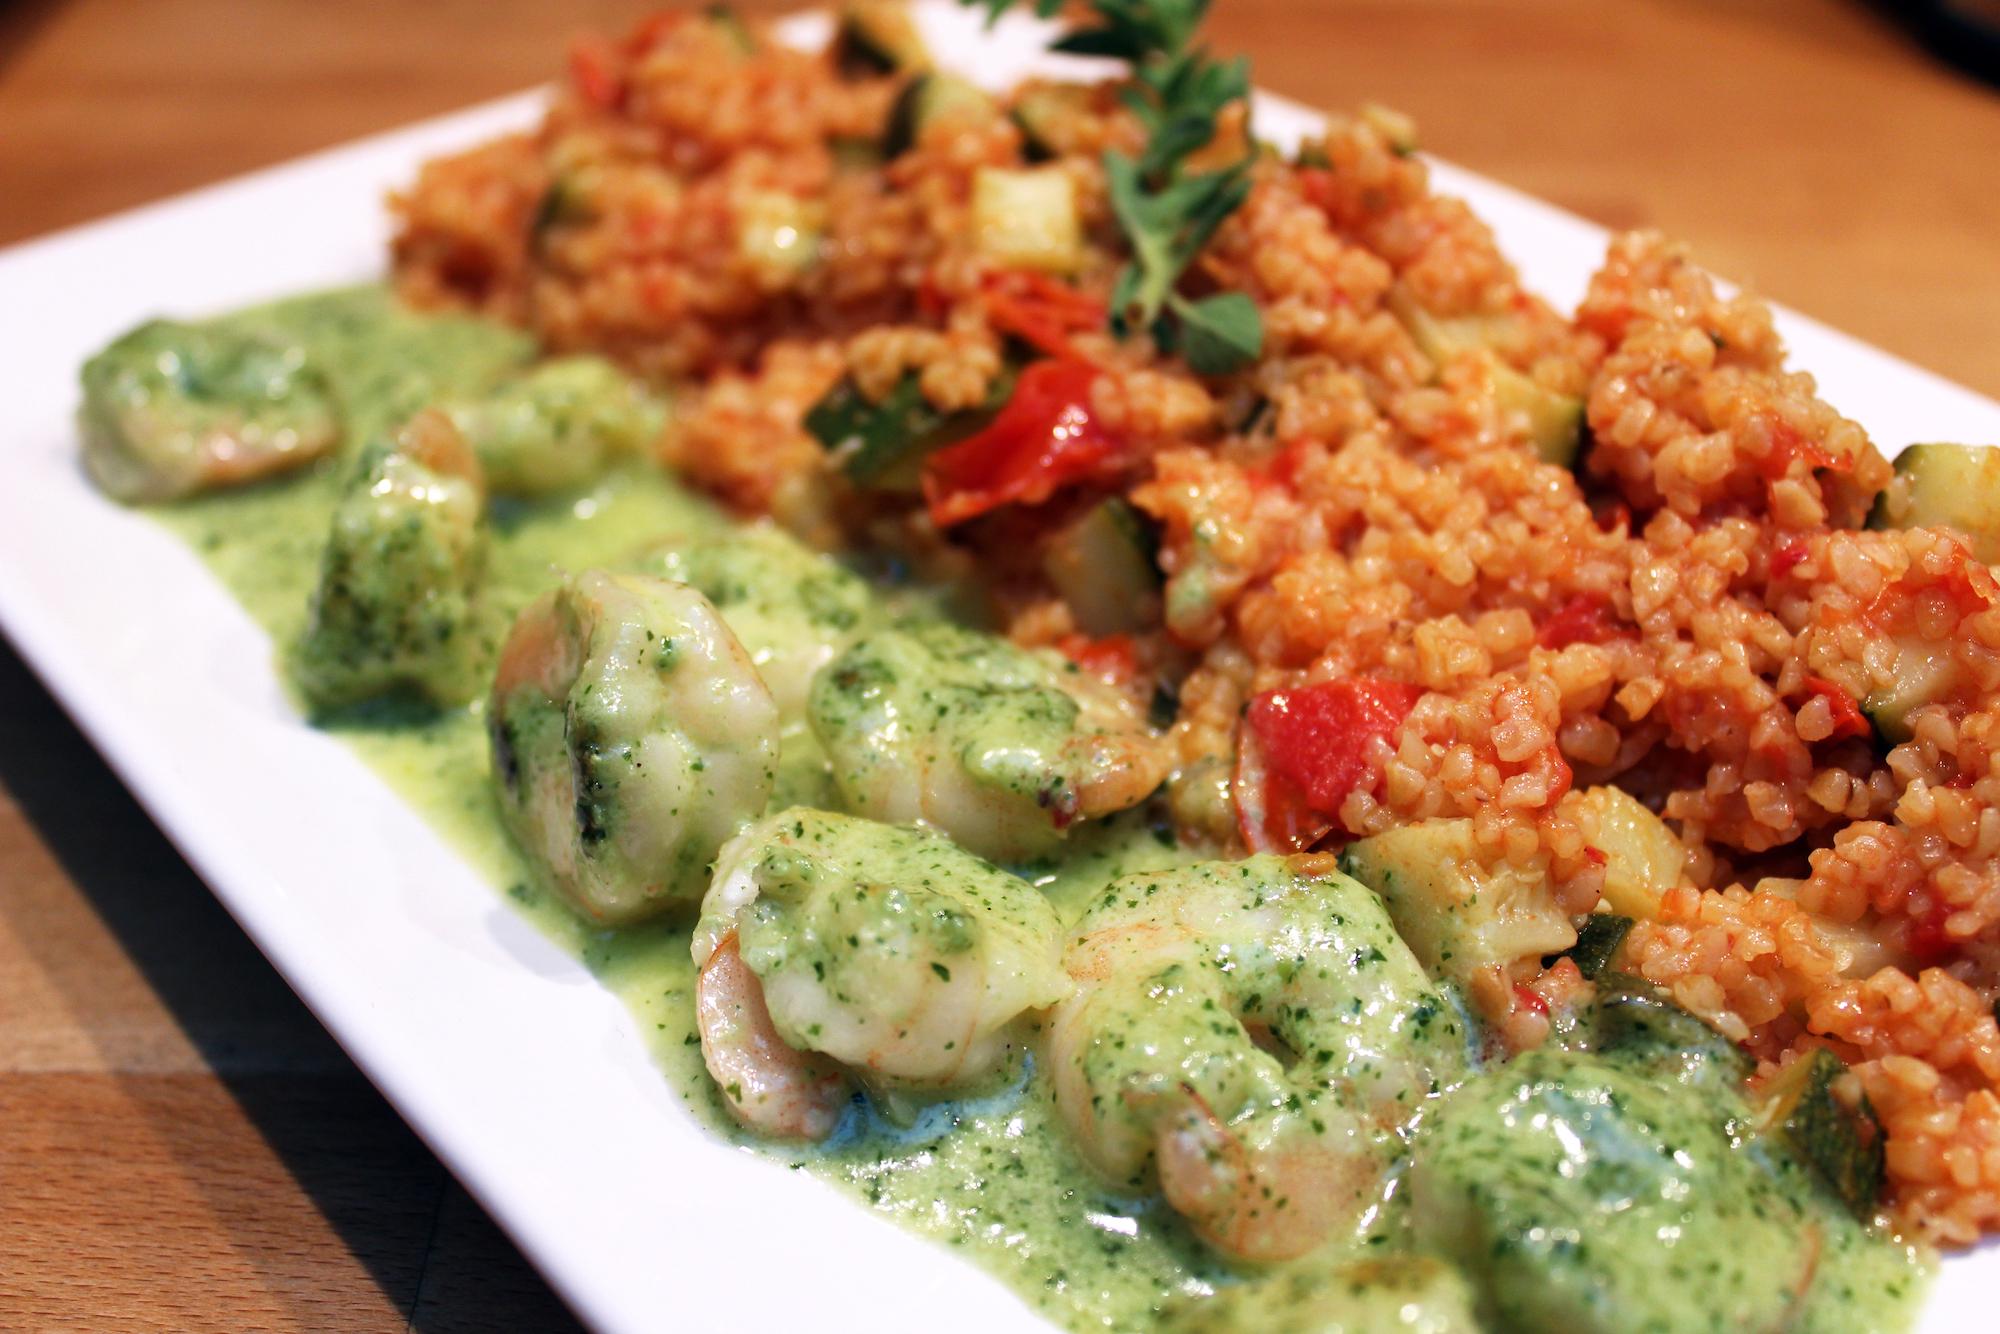 Scampi's in pestosaus met tomatenbulgur (Colruyt)